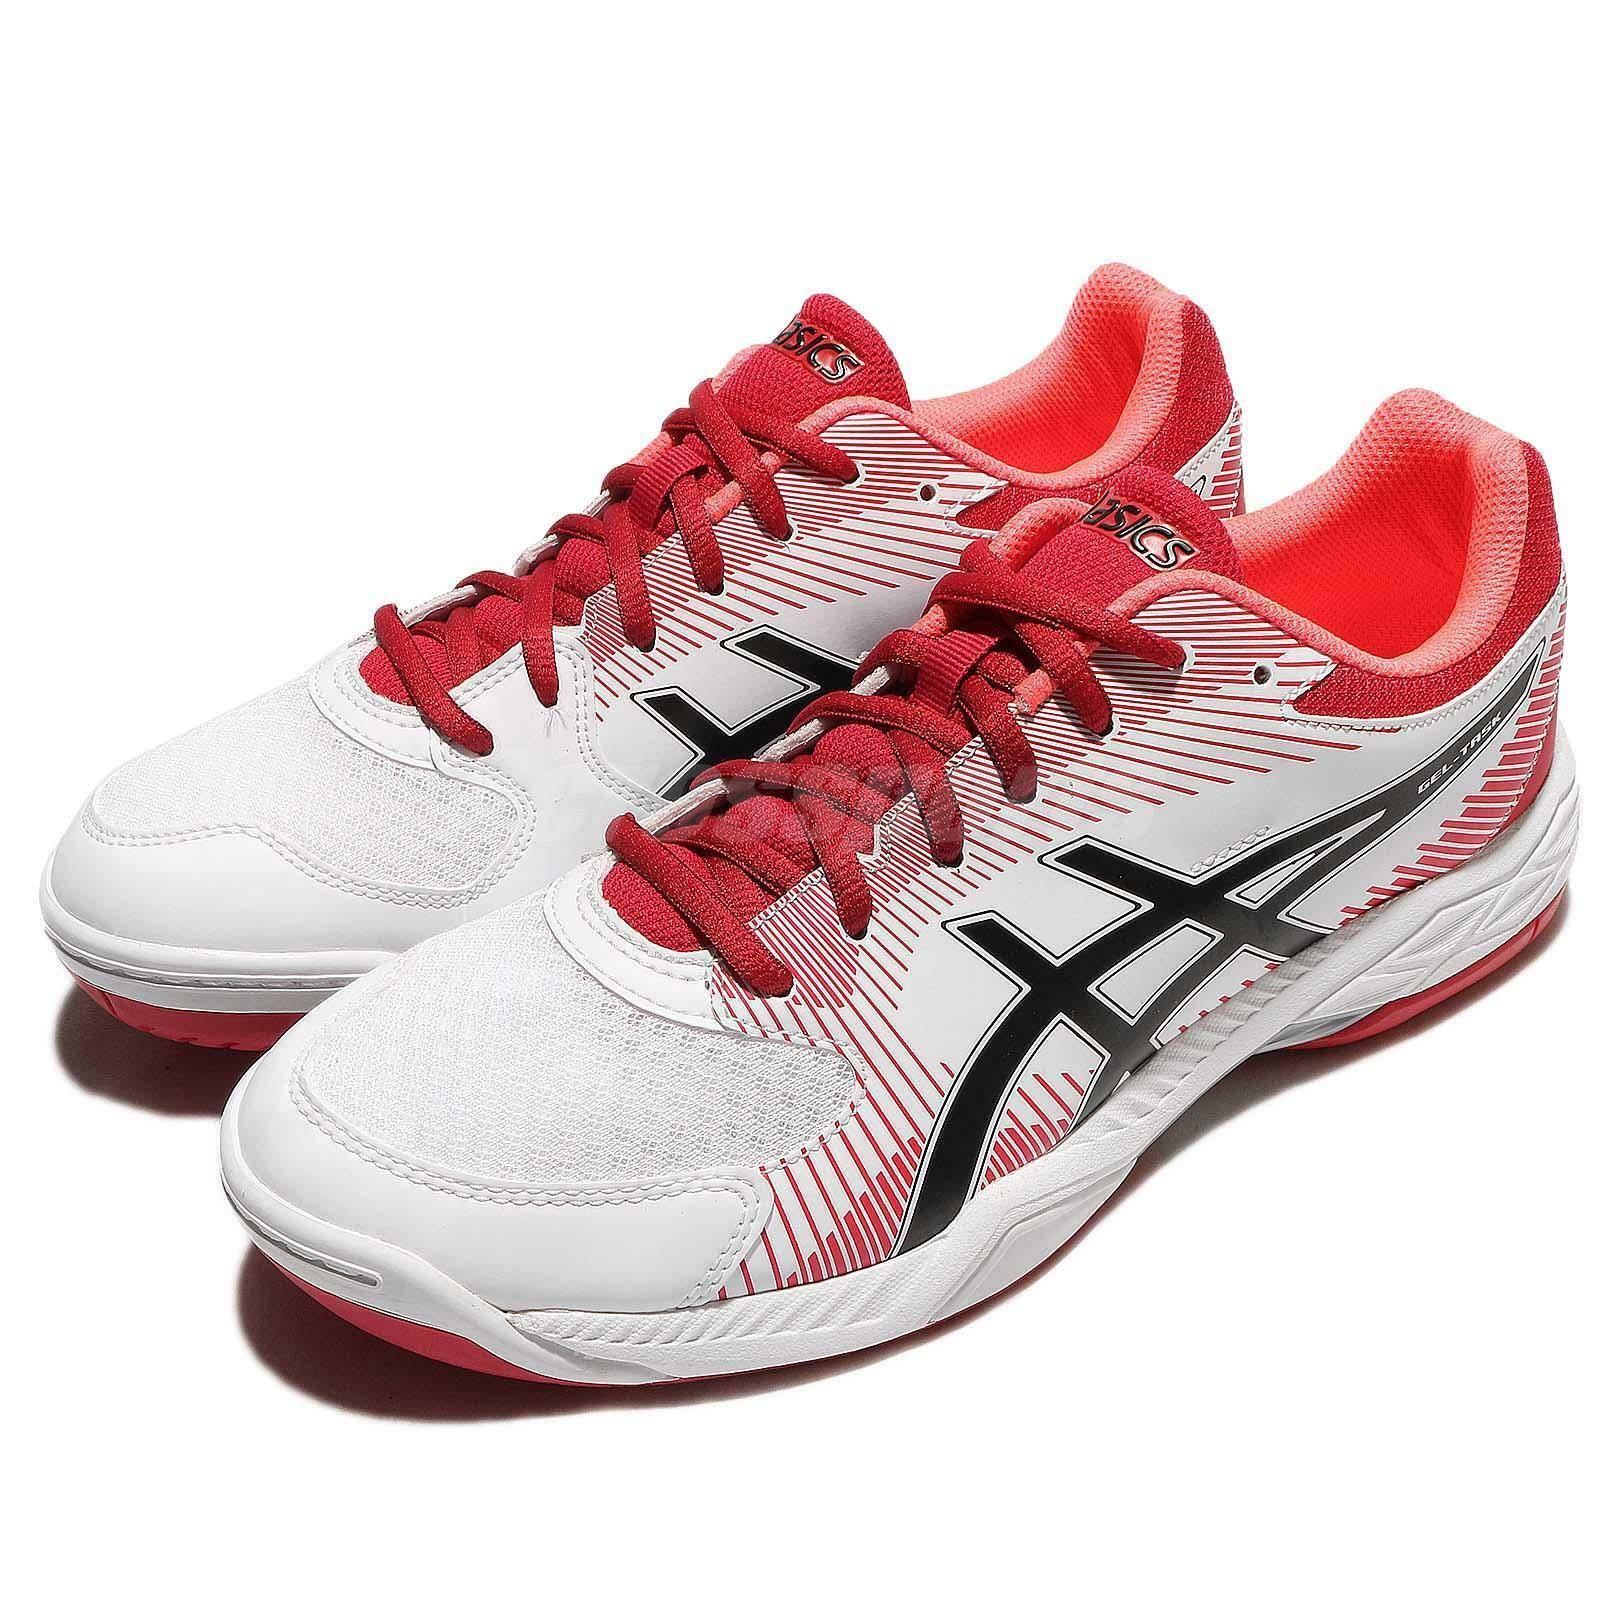 Asics Gel-Task White Red Black Men Badminton Volleyball Shoes Sneaker B704Y-0123